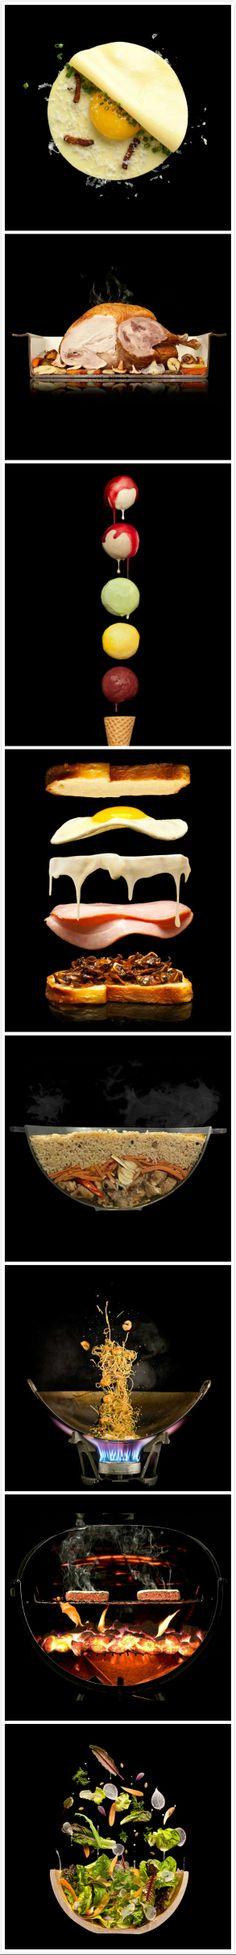 """Modernist Cuisine"" by Nathan Myhrvold"